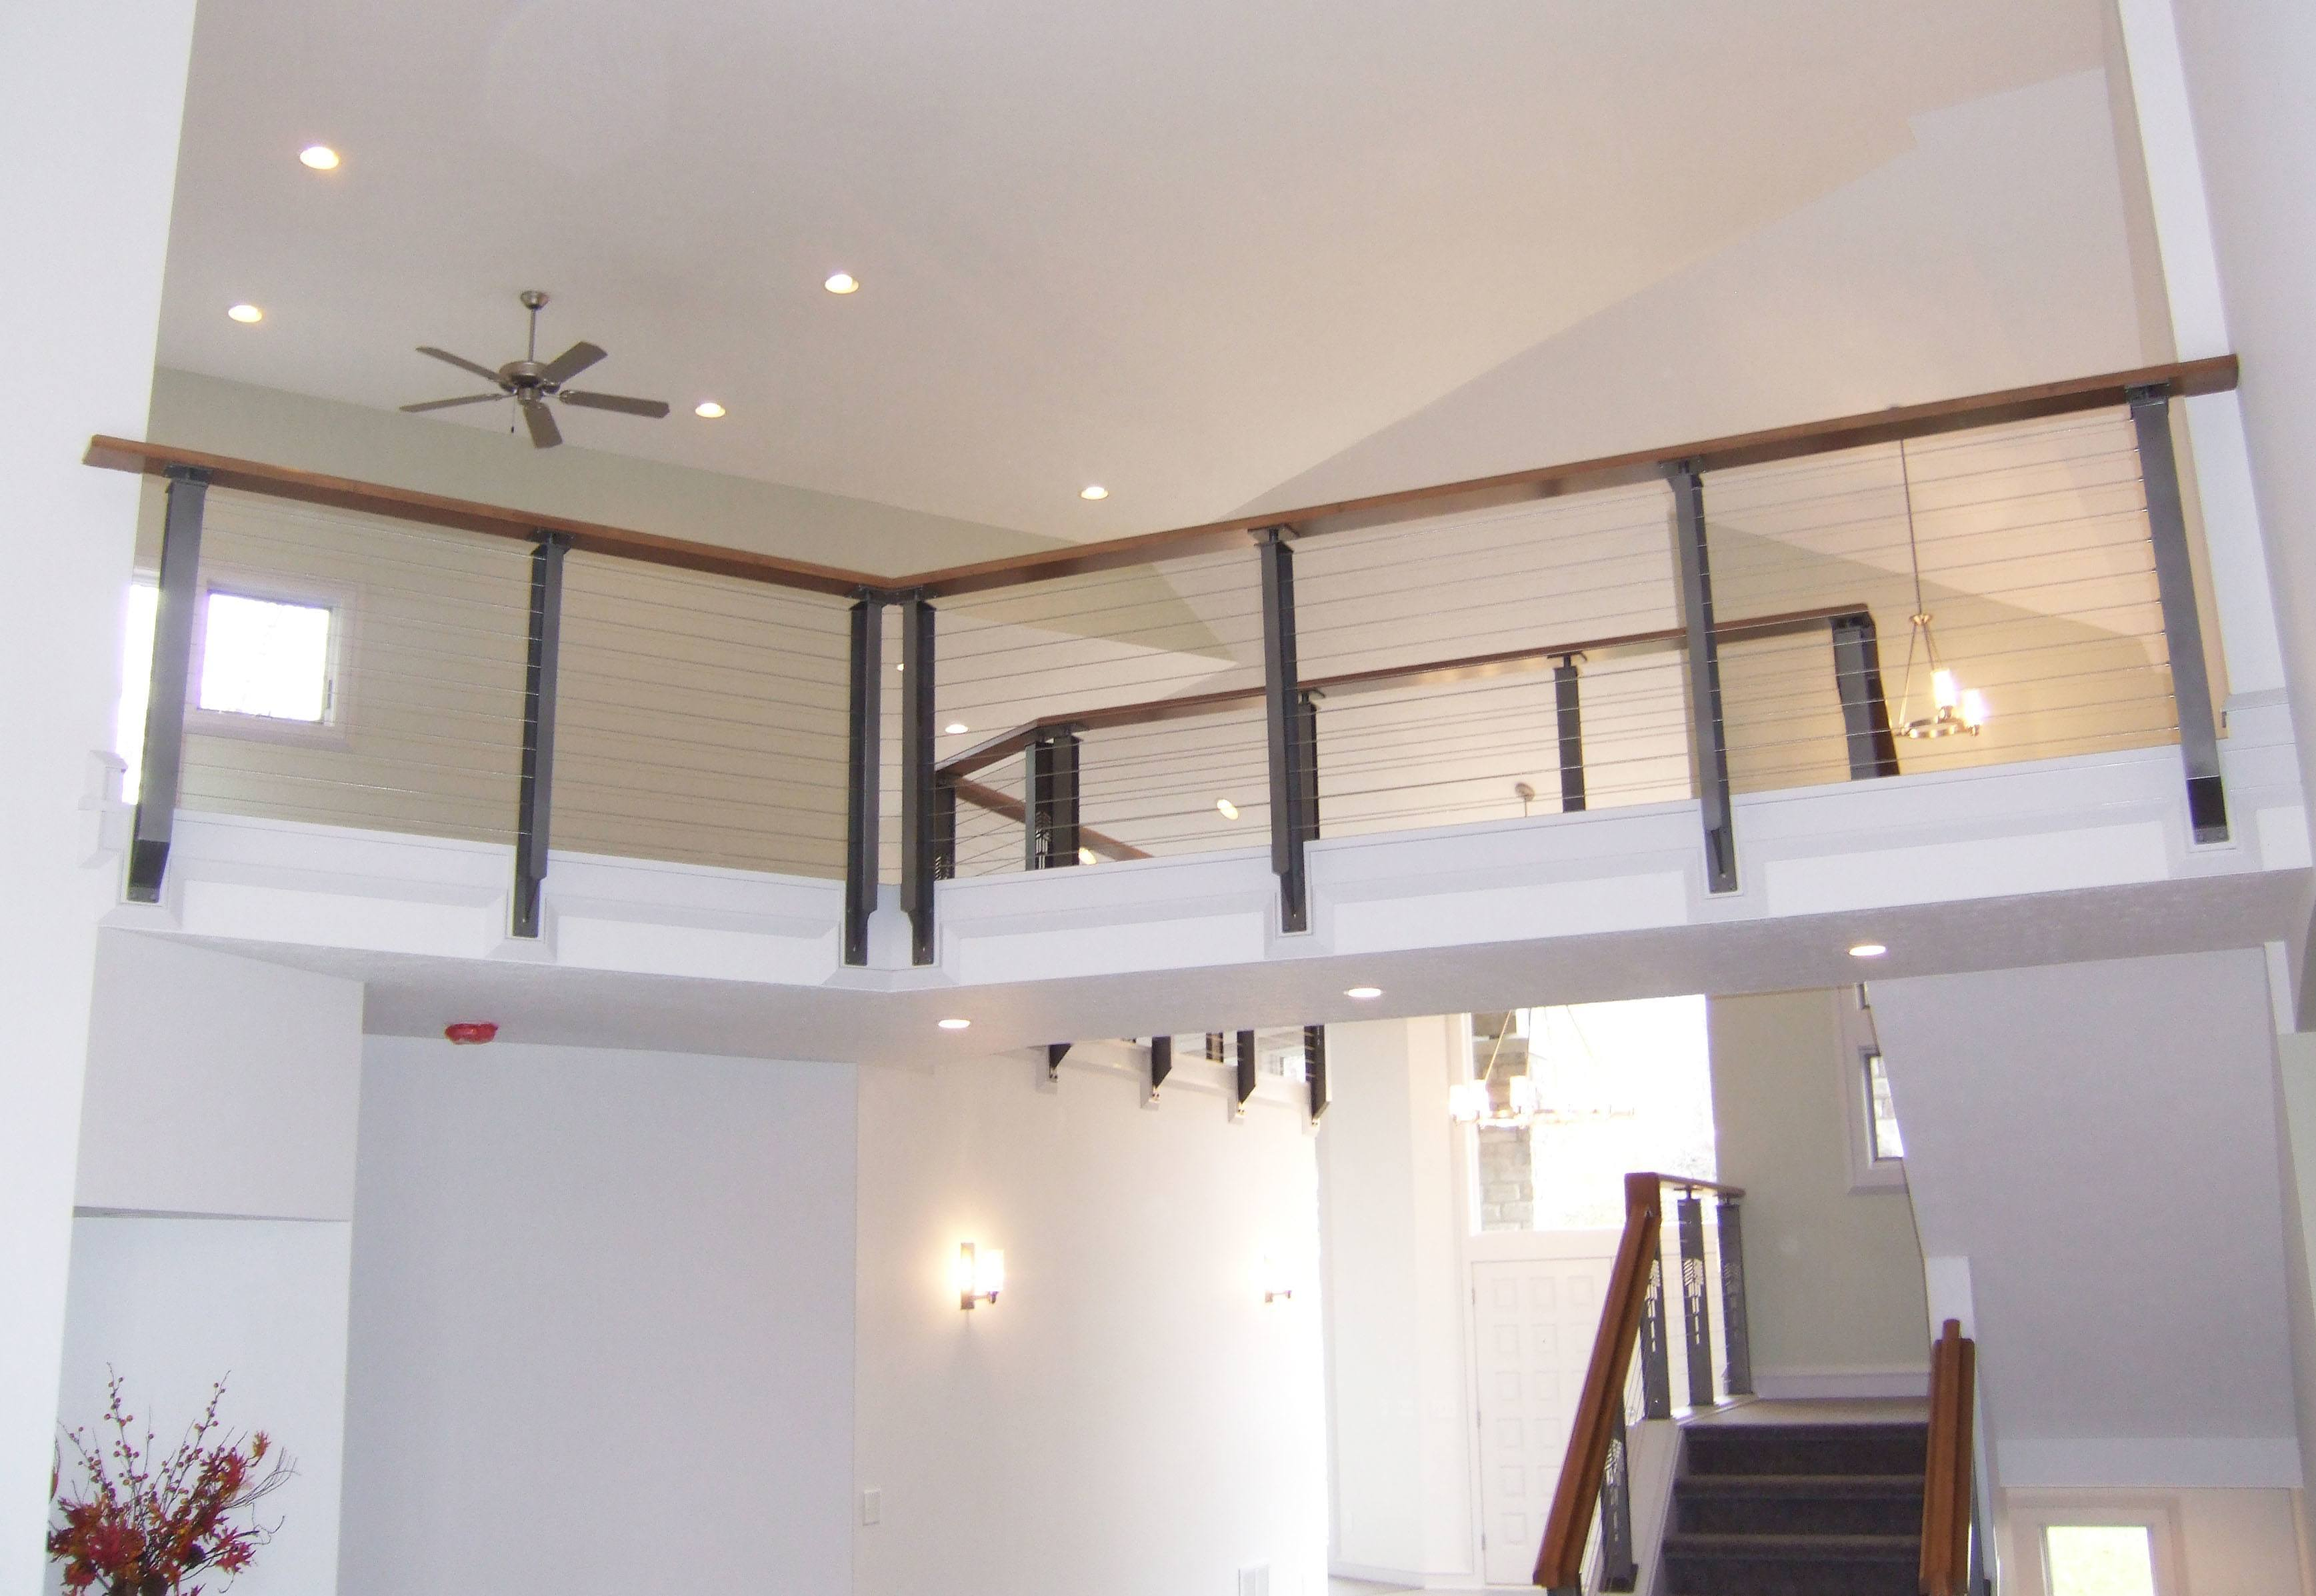 Bridge over interior living room